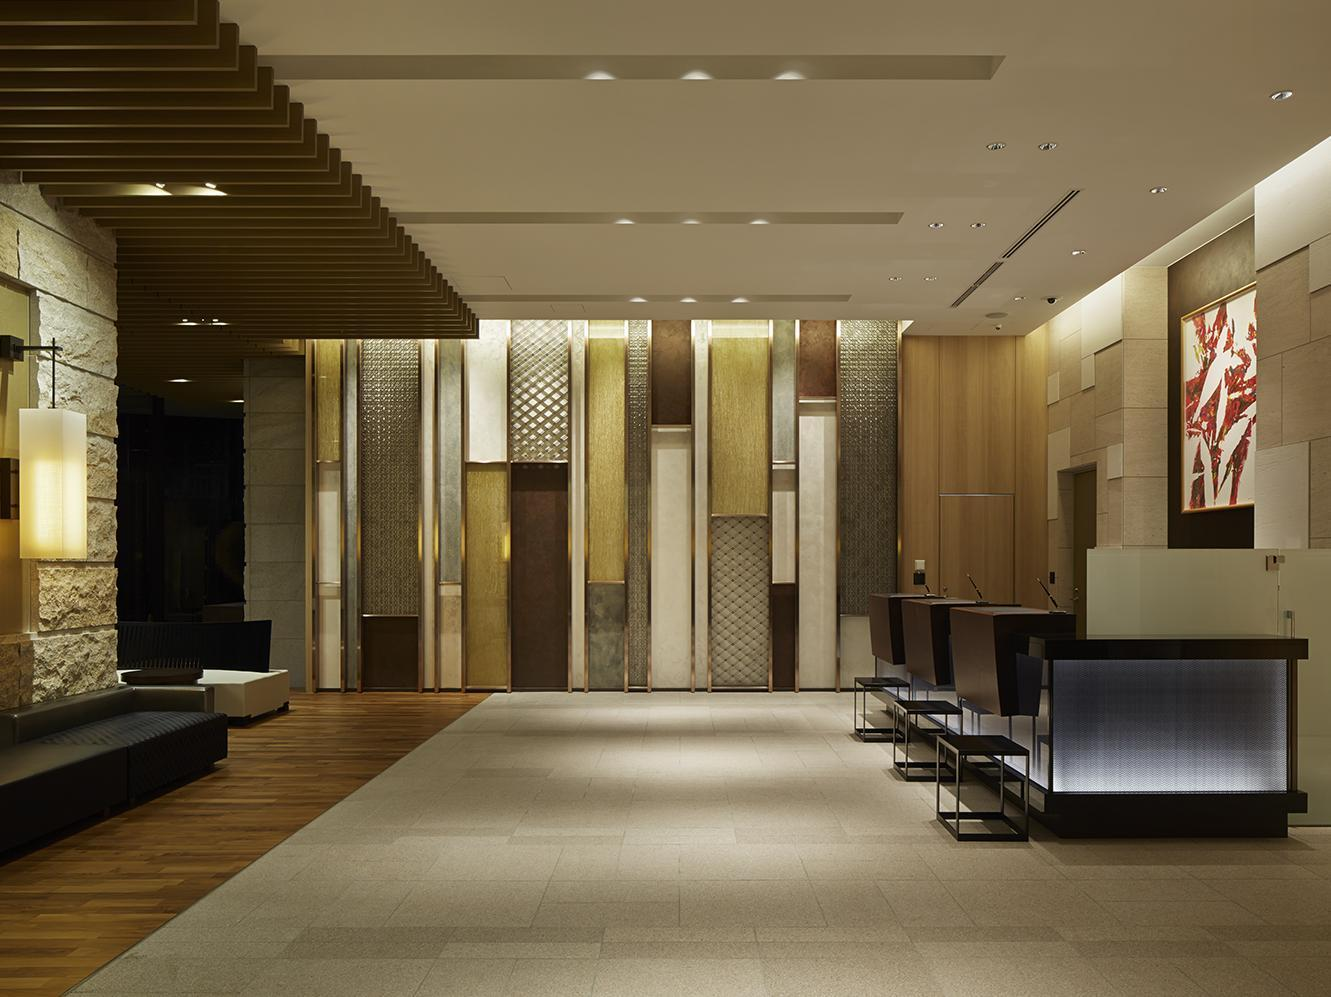 Mitsui Garden Hotel Osaka Premier in Japan